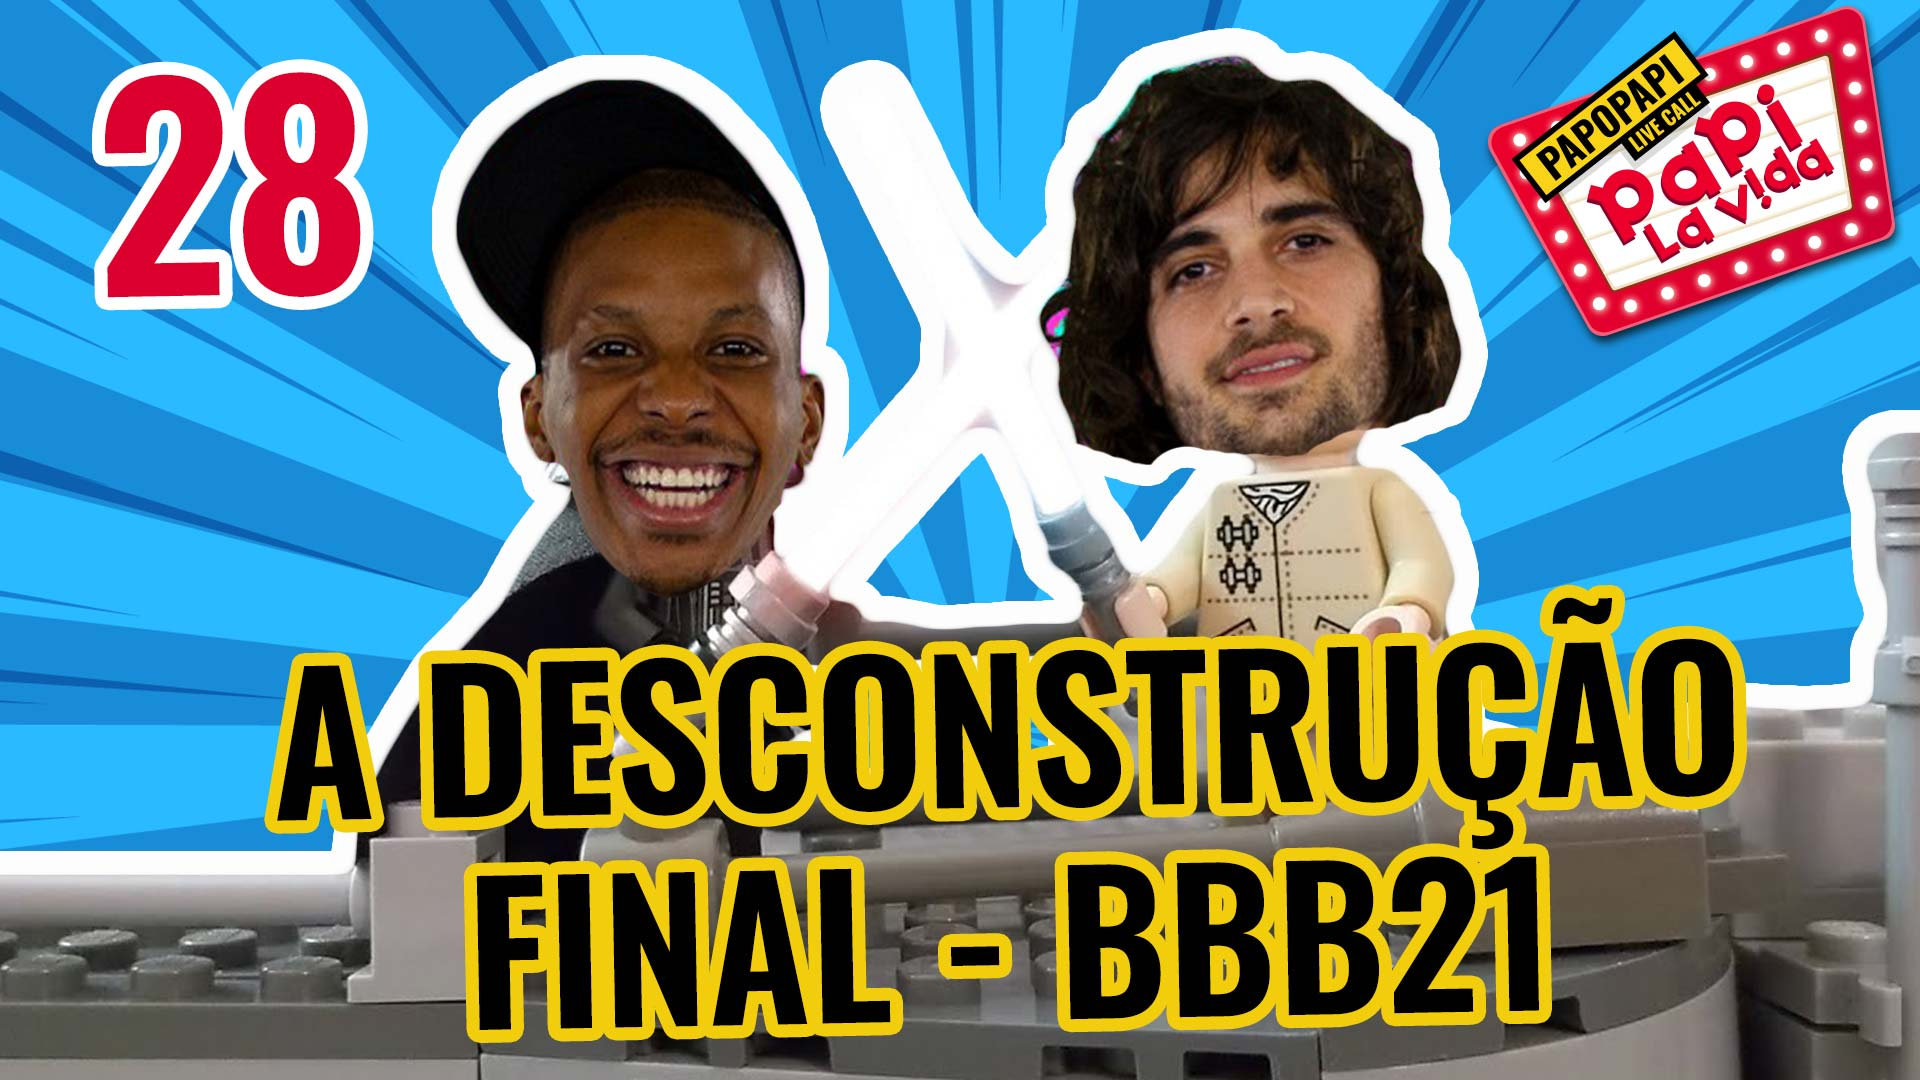 BBB21 - A Desconstrução Final